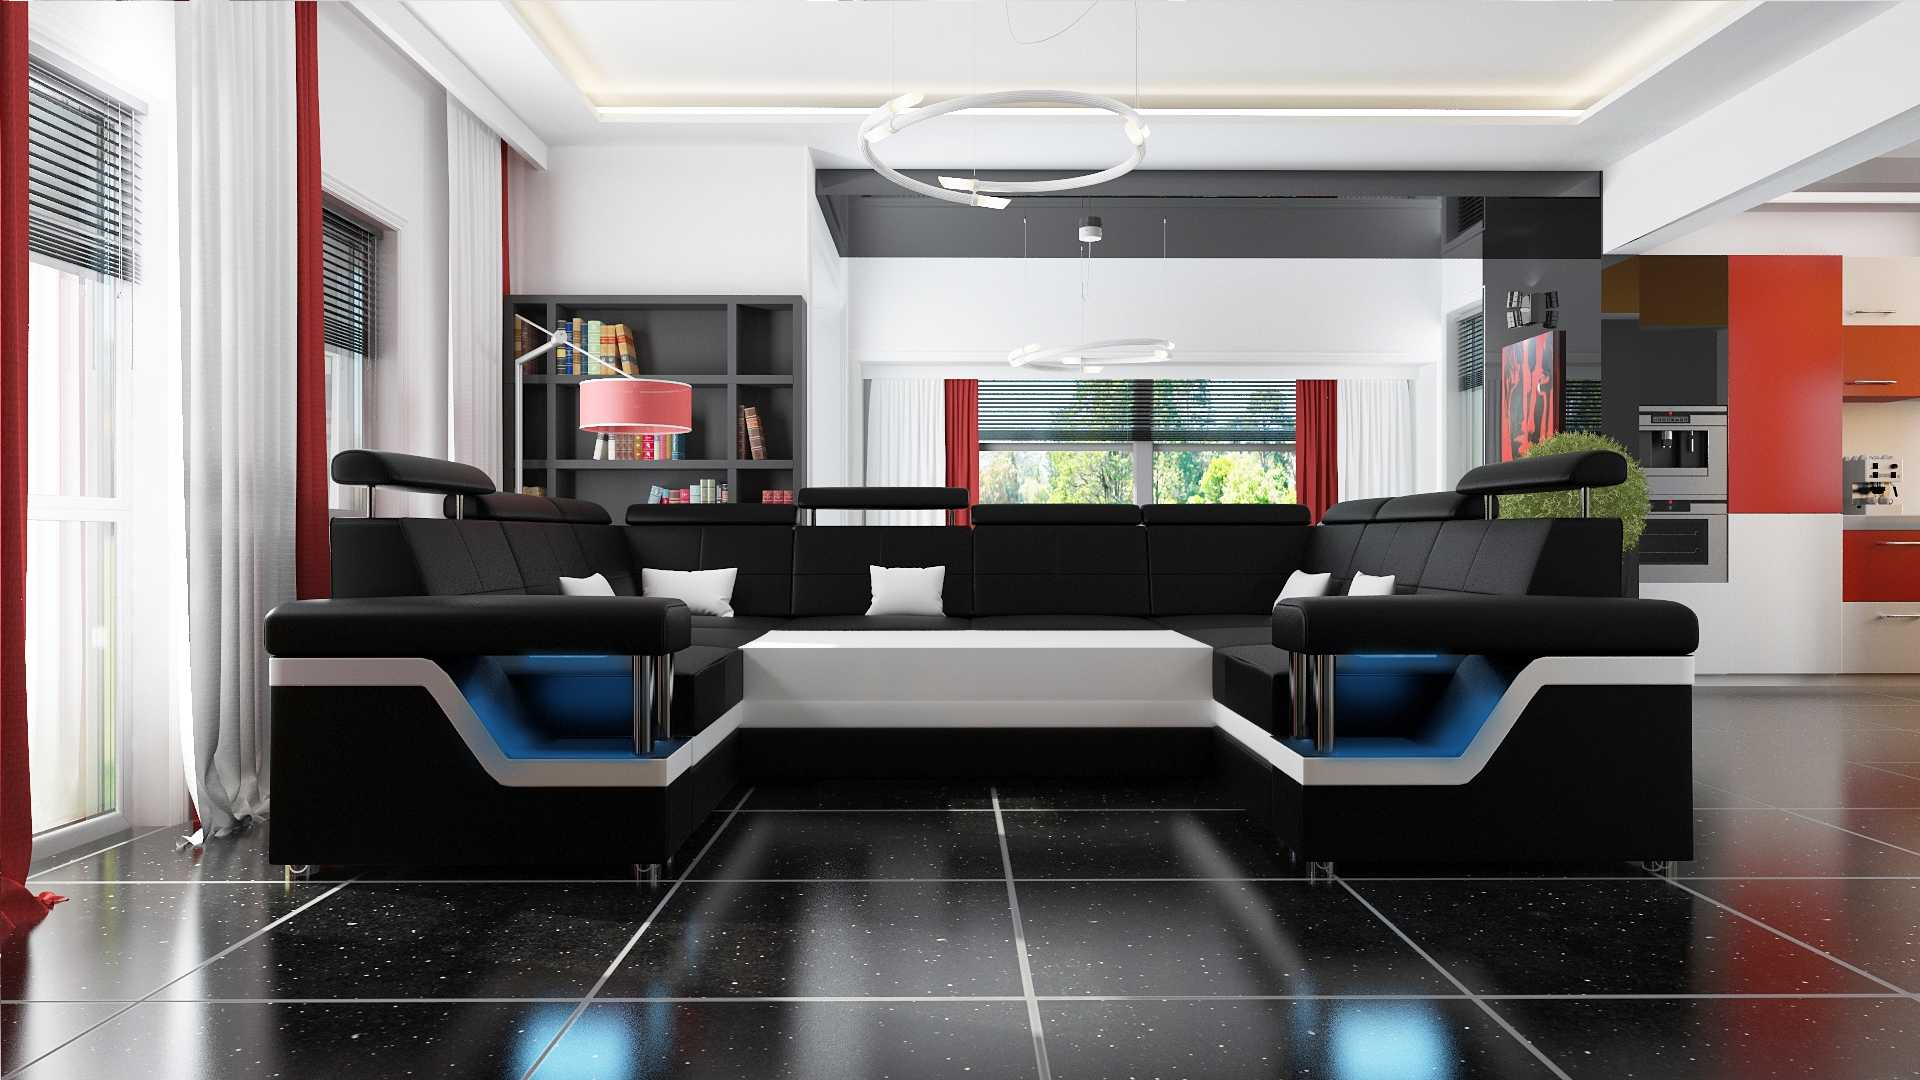 sofas und ledersofas hamburg 4 bettfunktion designersofa. Black Bedroom Furniture Sets. Home Design Ideas